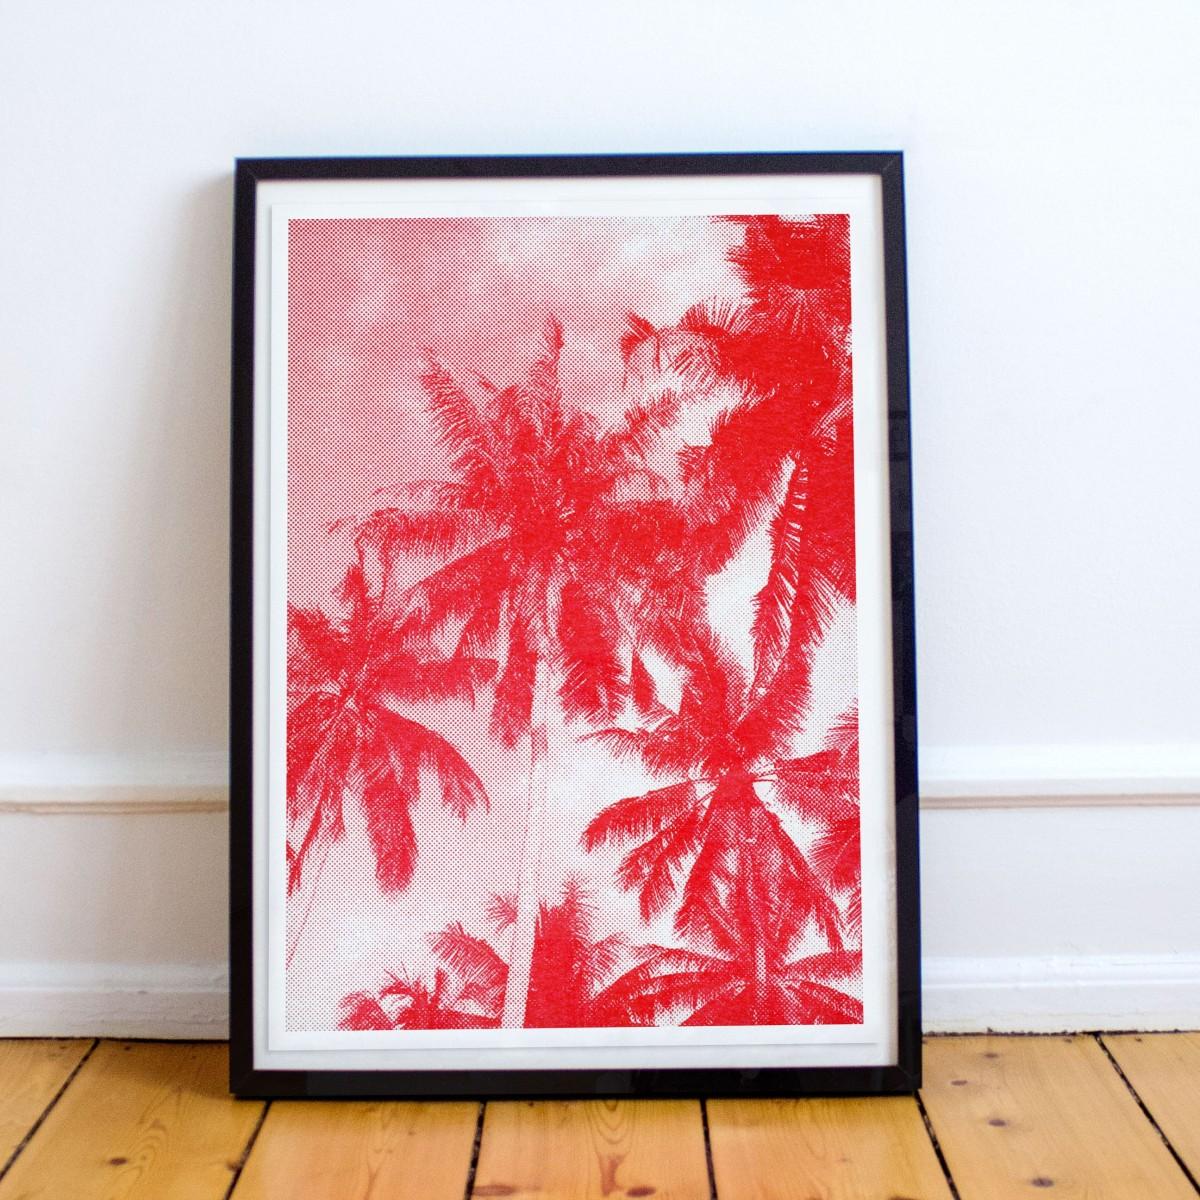 Risographie Poster – ARTPRINT SANSIBAR  – HERR & FRAU RIO